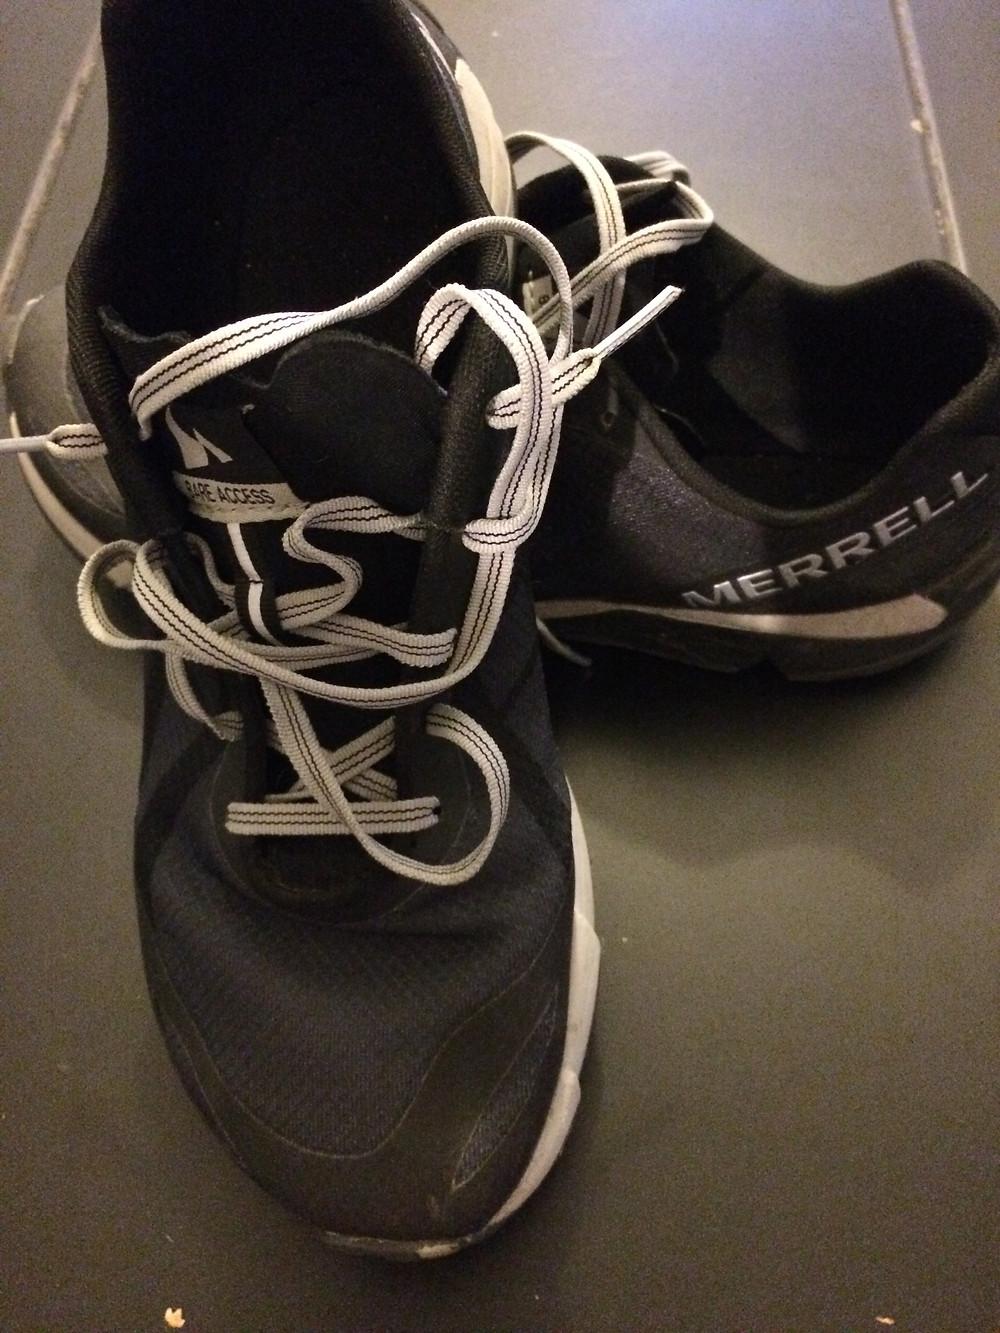 Merrell Bare Access 5. UK size 8.5